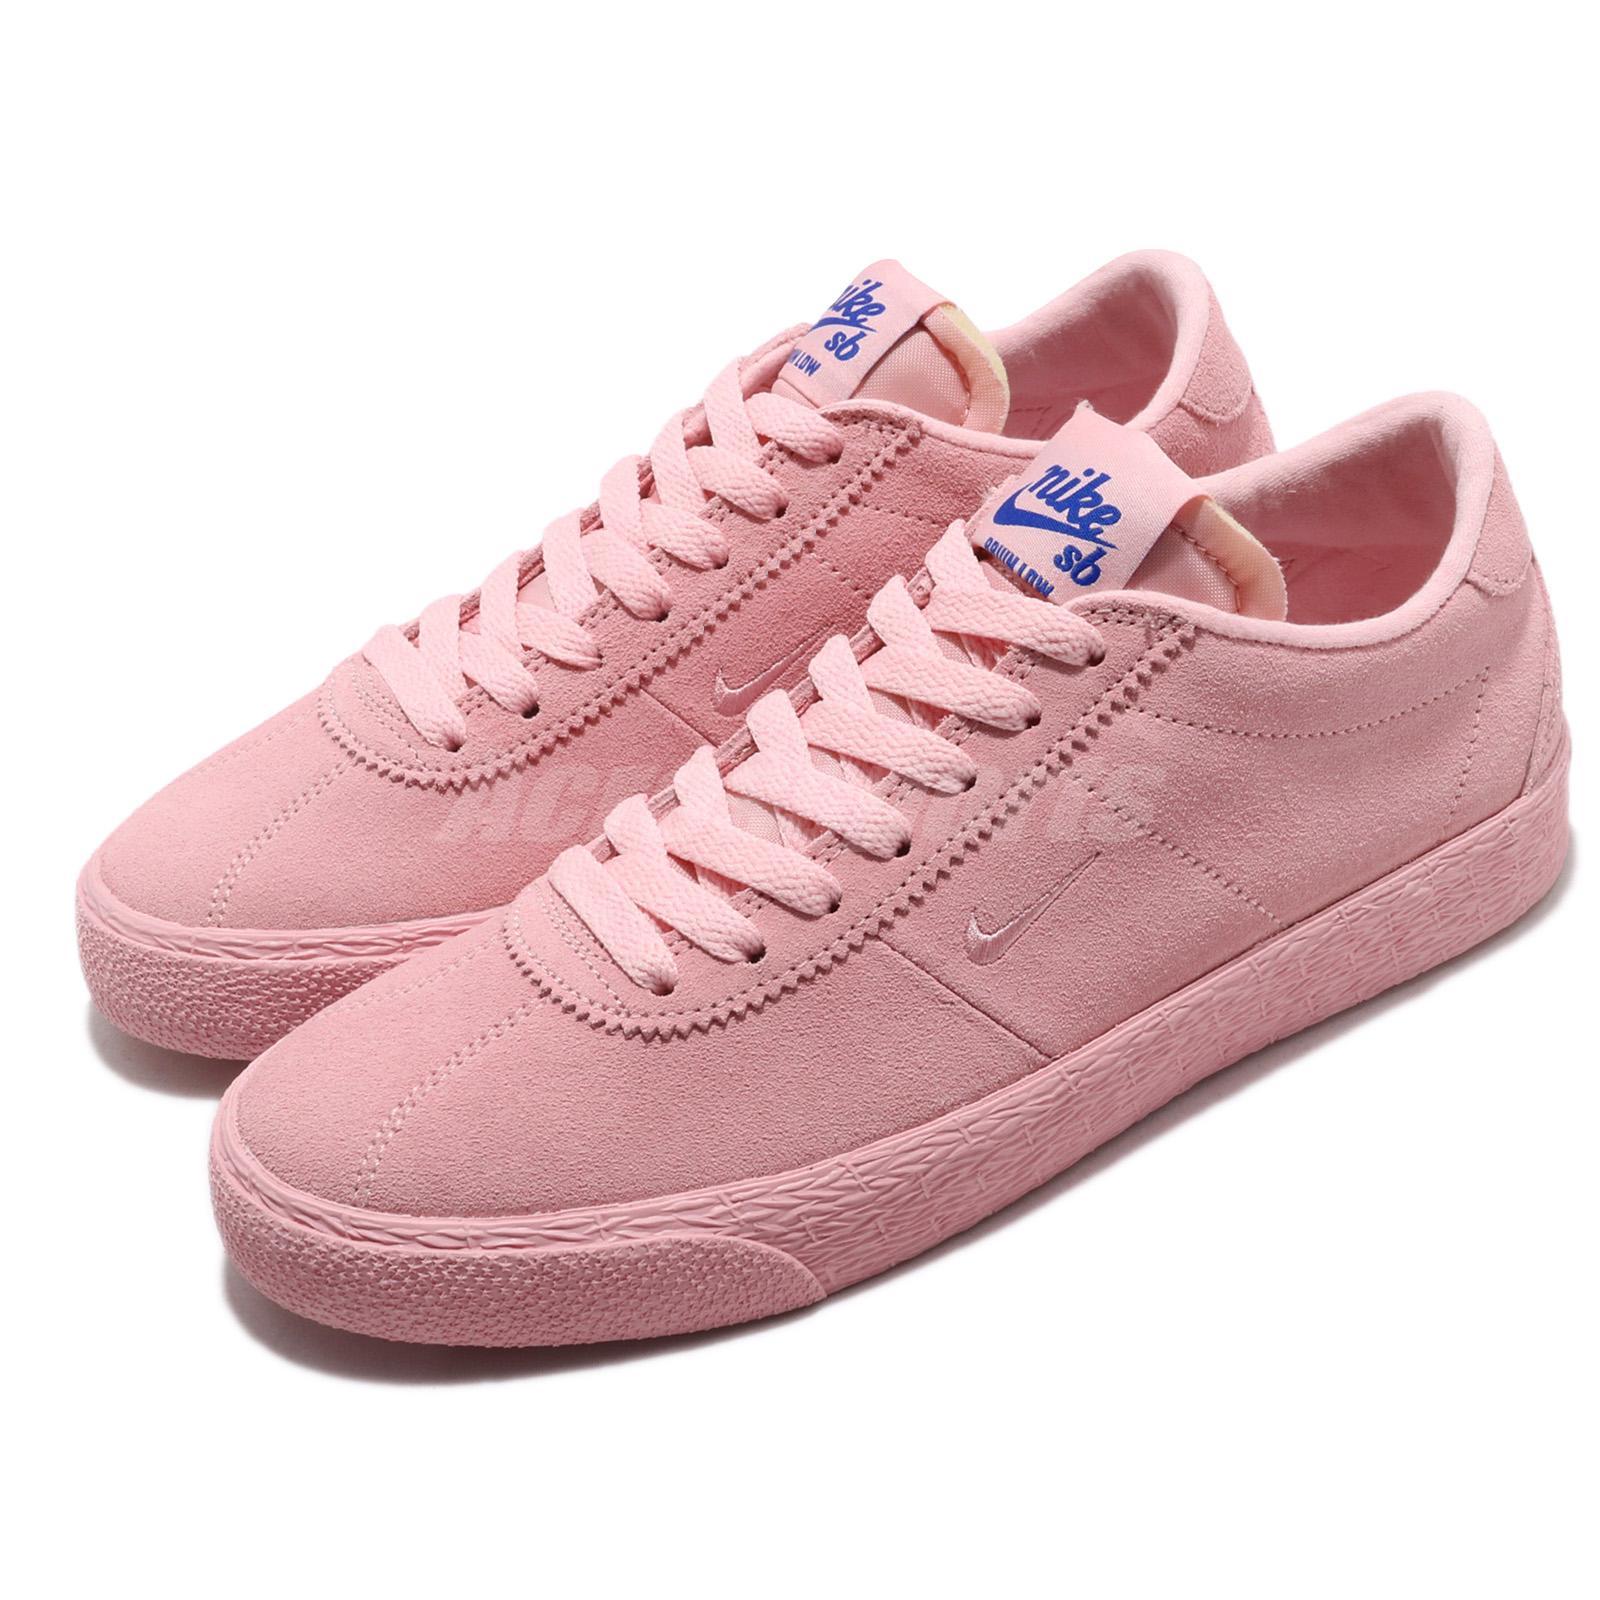 f9dfdd515841e Details about Nike SB Zoom Bruin NBA Bubblegum Men Skate Boarding Shoes  Sneakers AR1574-669